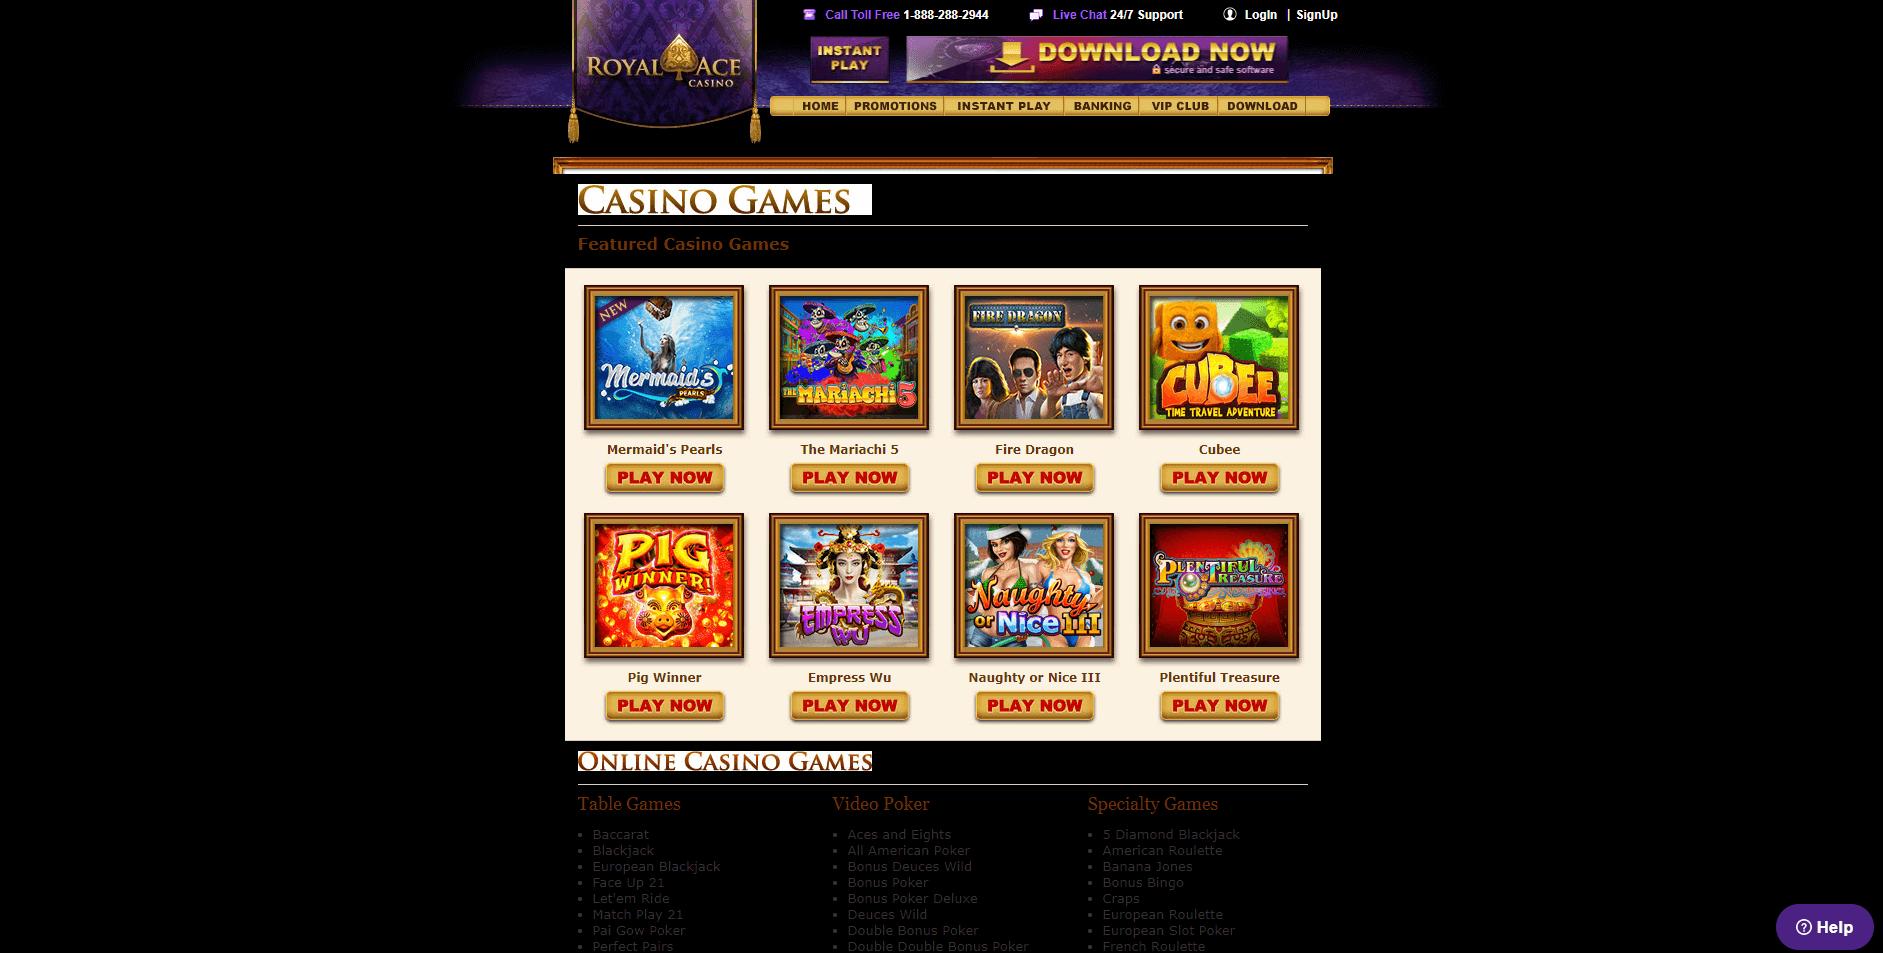 royal ace casino $100 no deposit bonus codes 2018